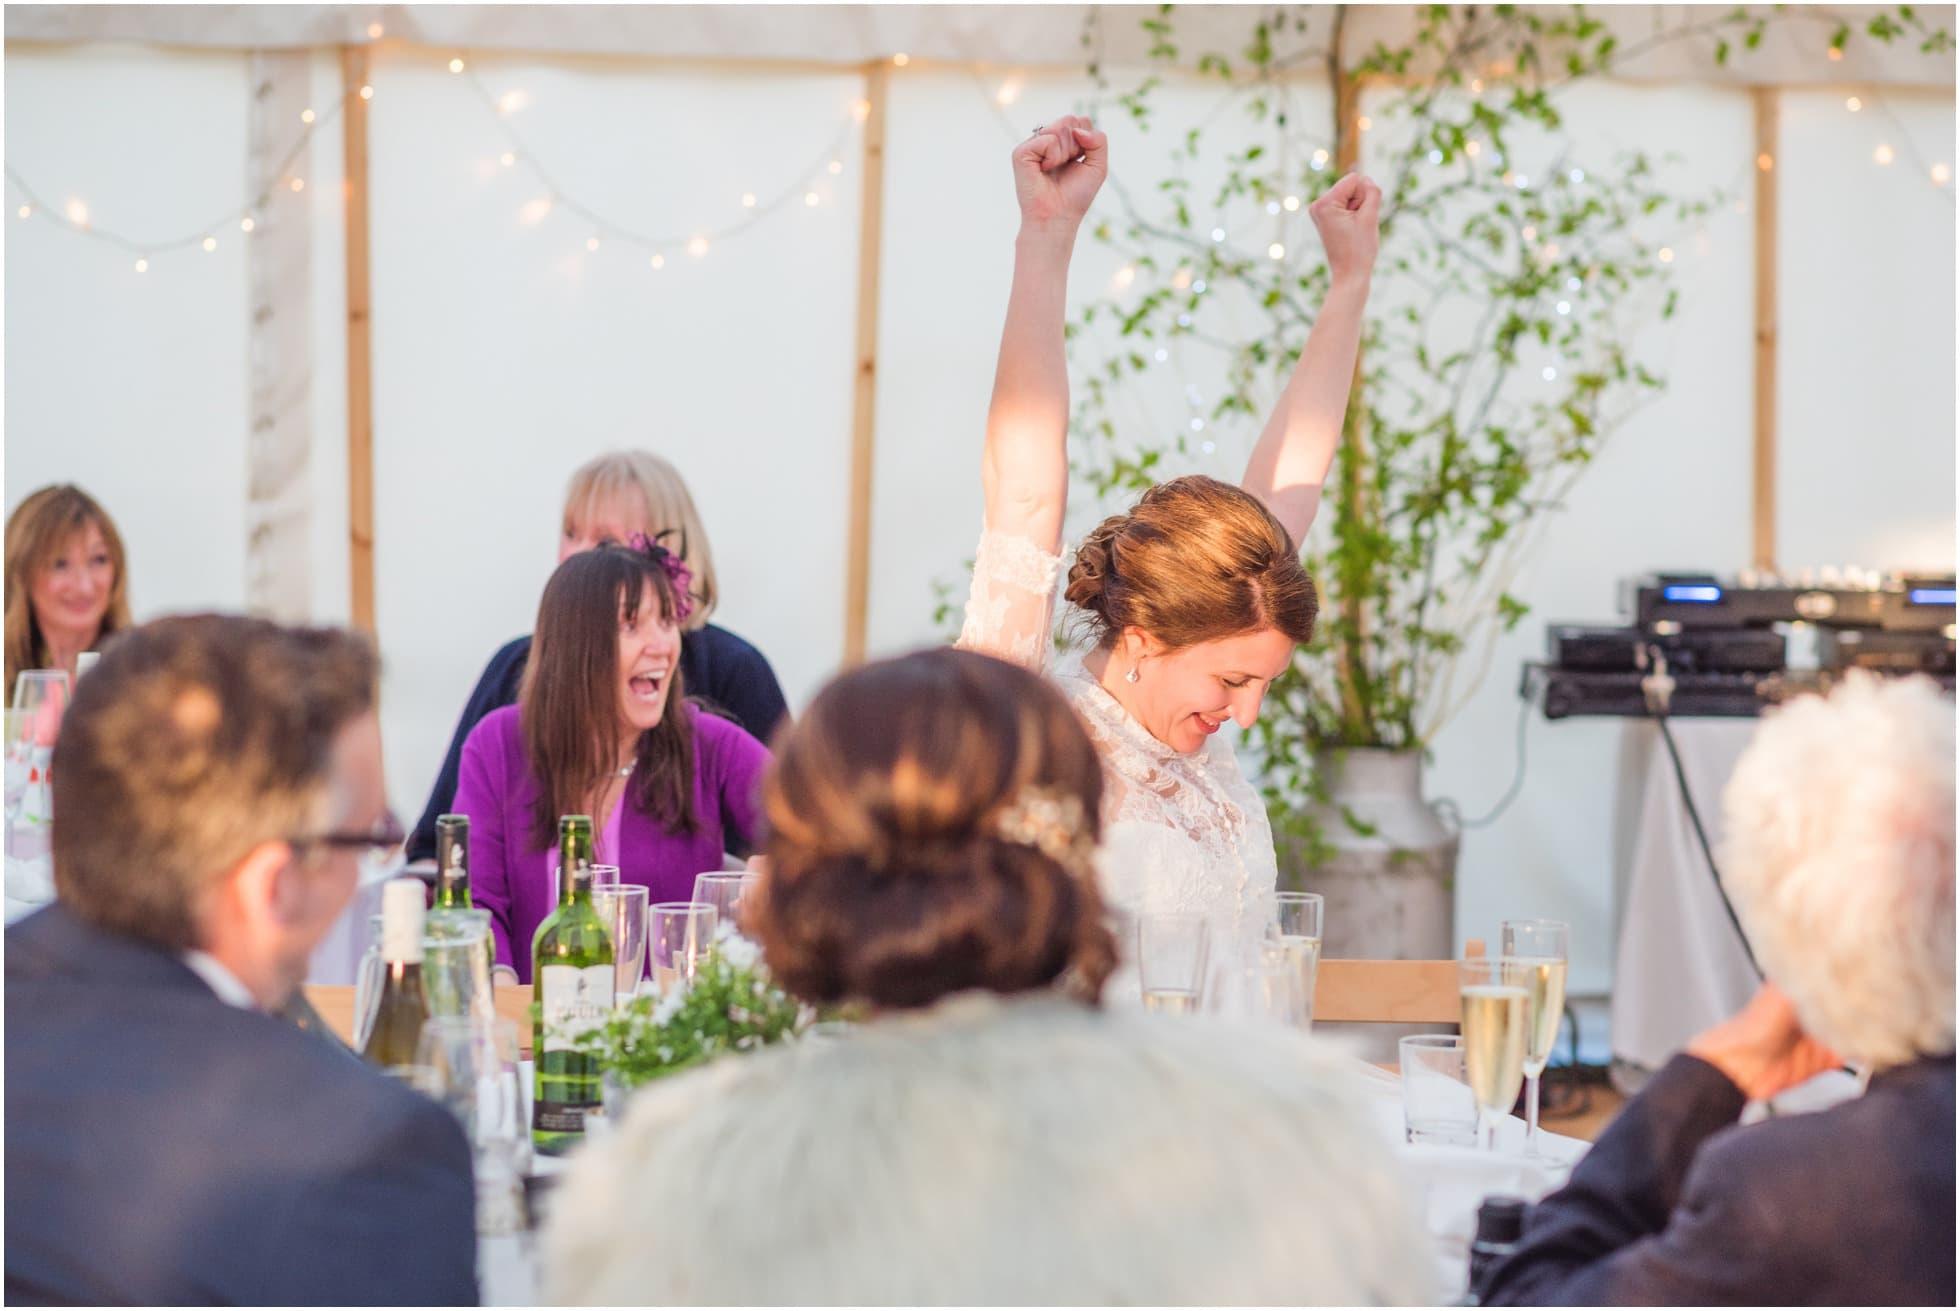 Bride in a celebratory mood!